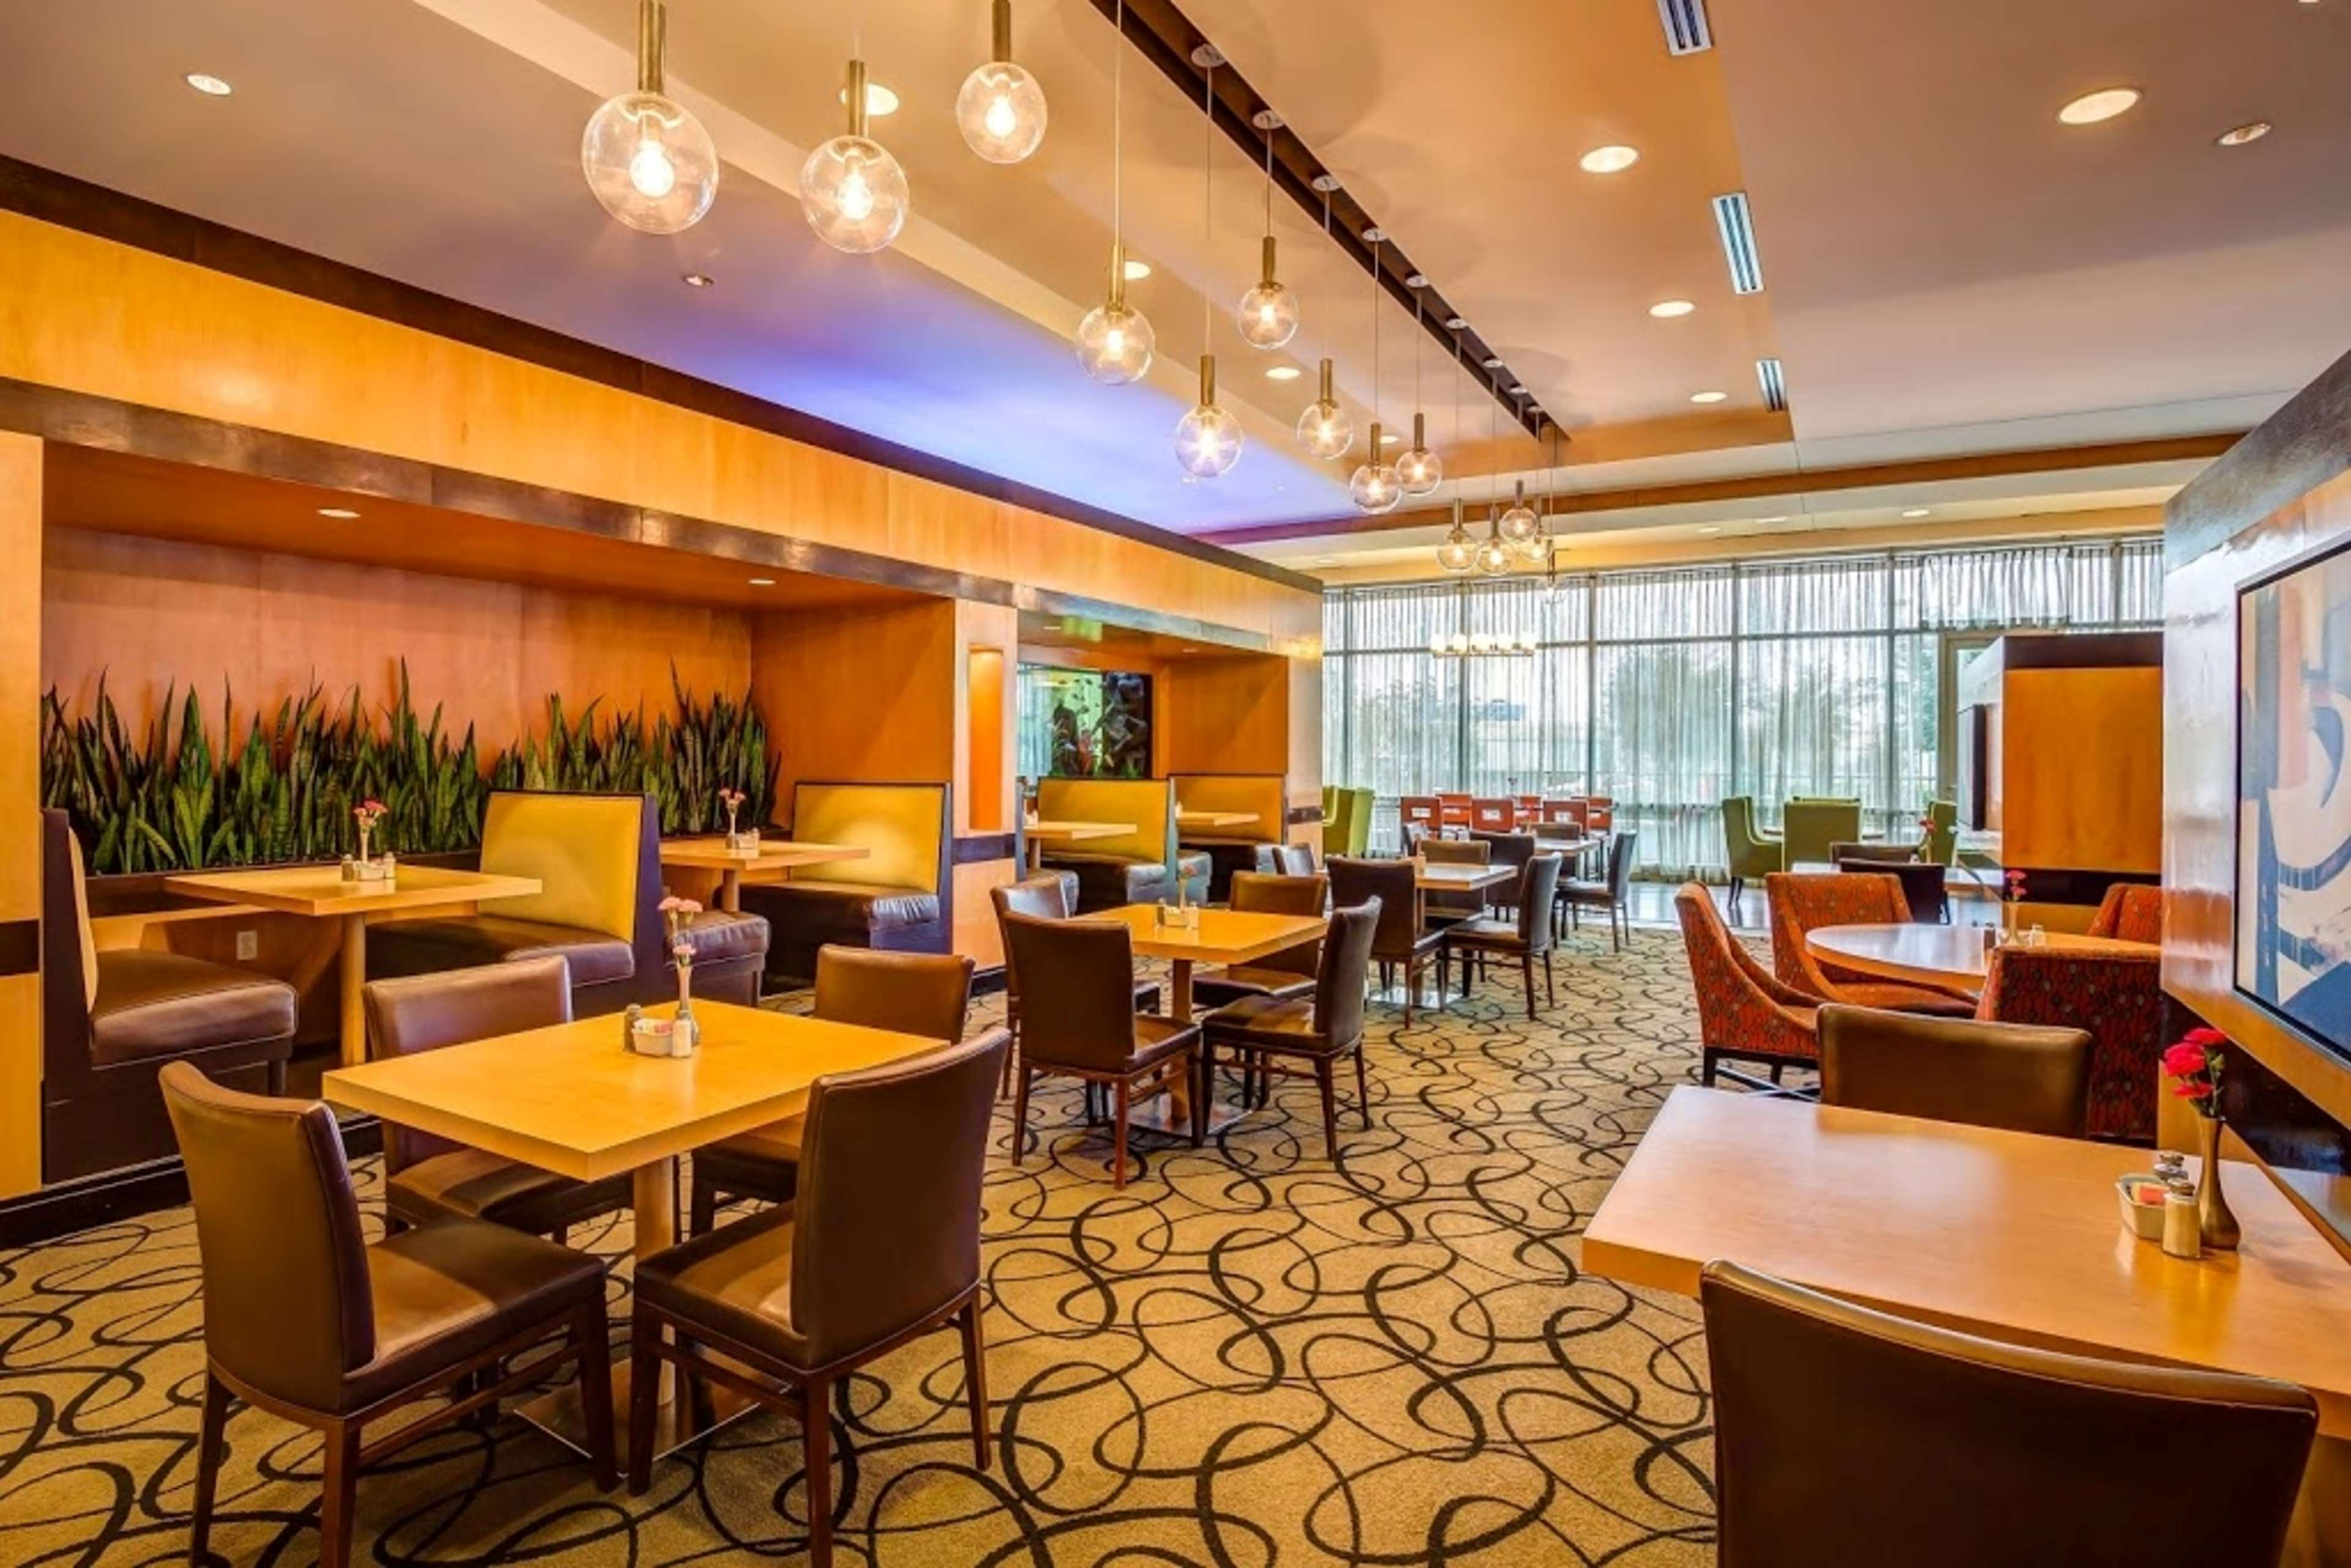 Embassy Suites by Hilton Houston Energy Corridor image 15